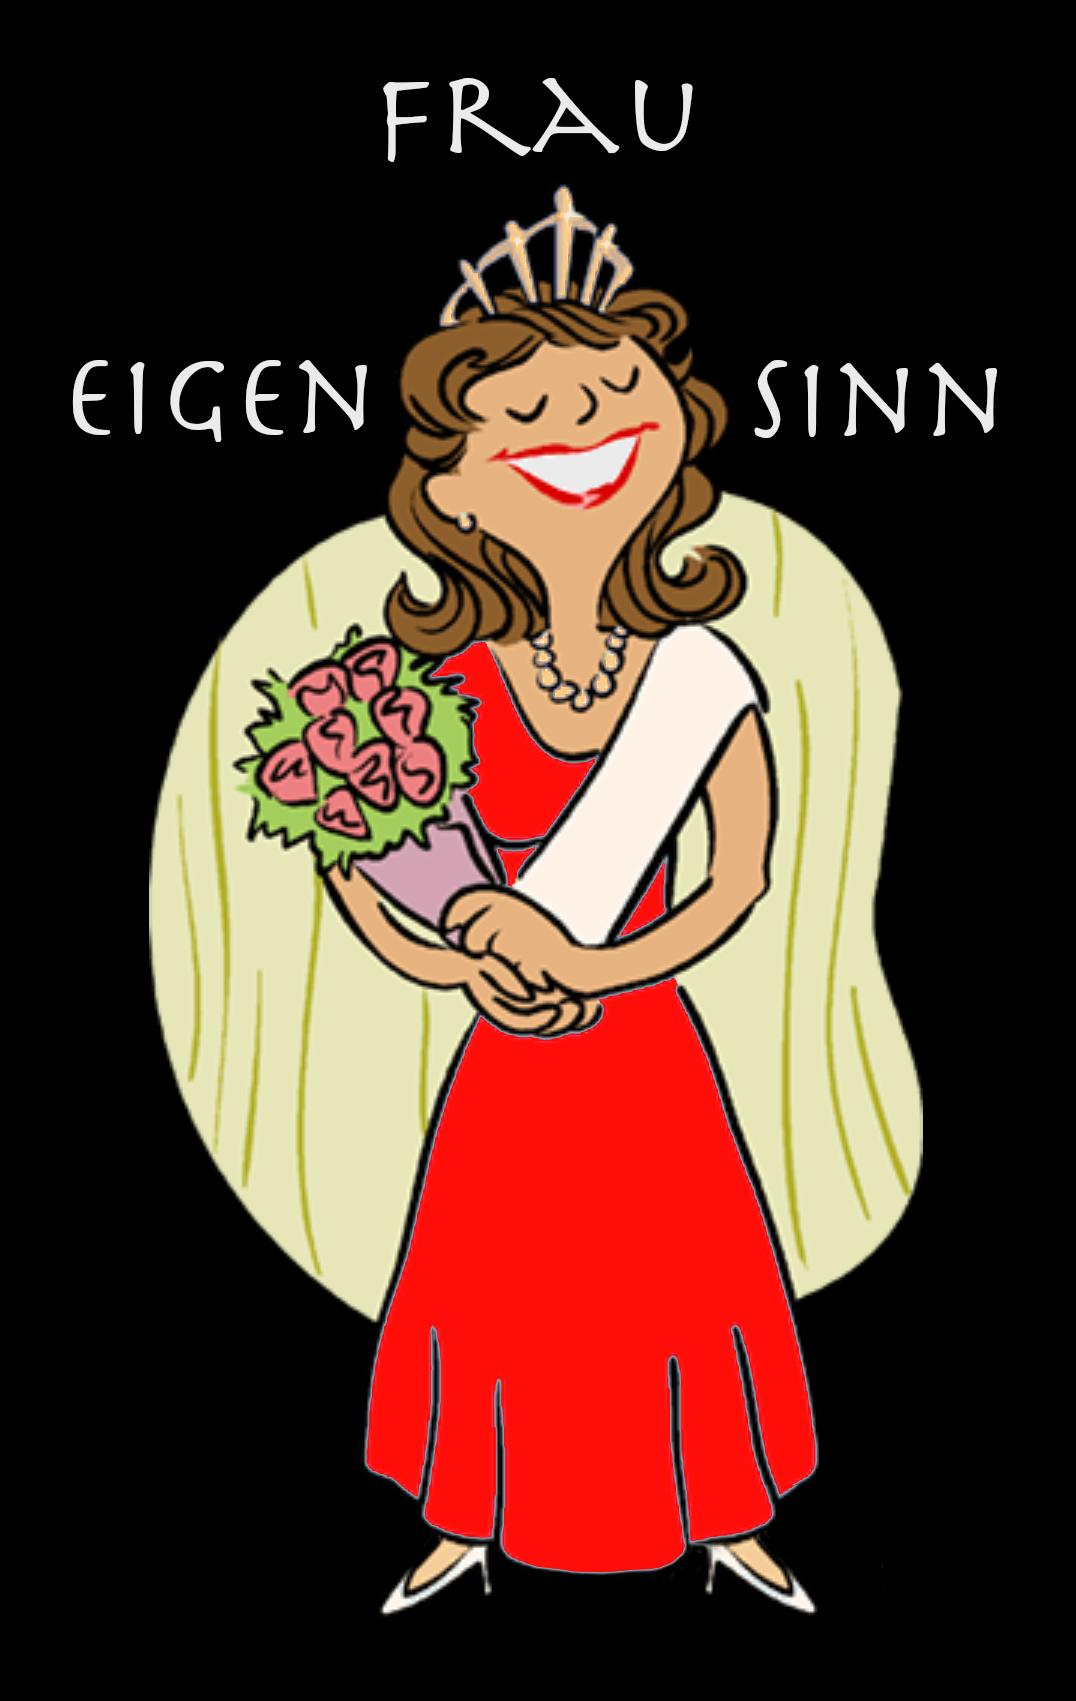 Frau Eigensinn.png